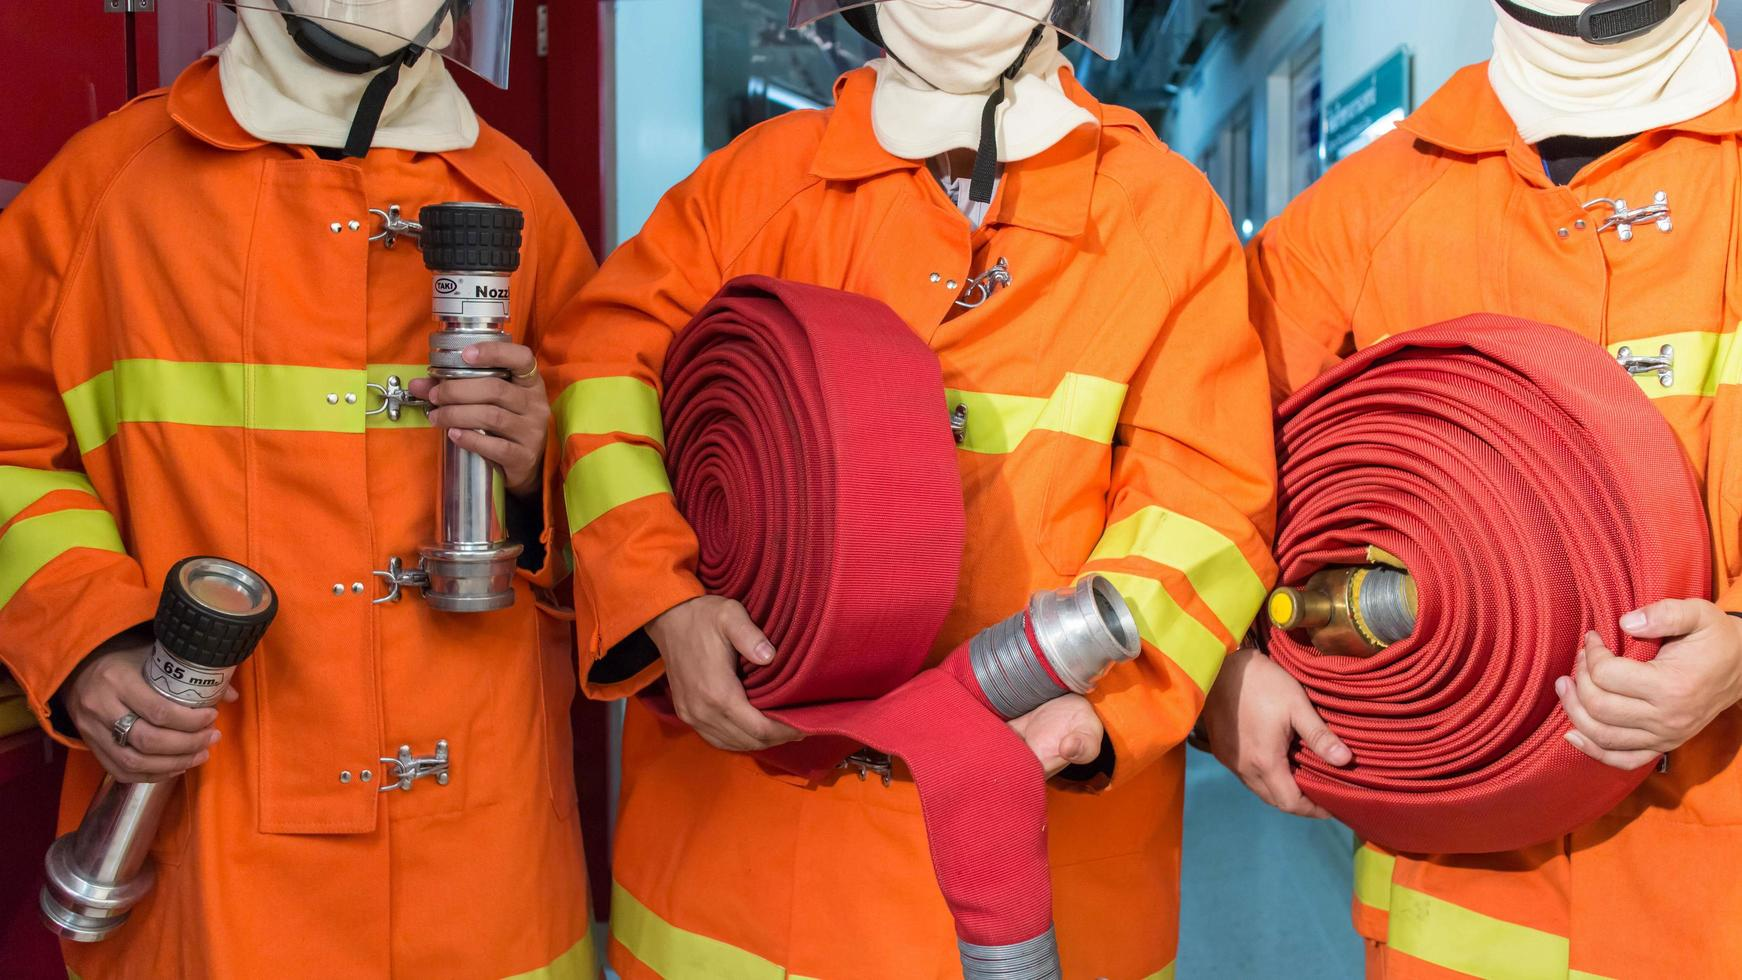 brandweerlieden in uniforme holdingsuitrusting foto